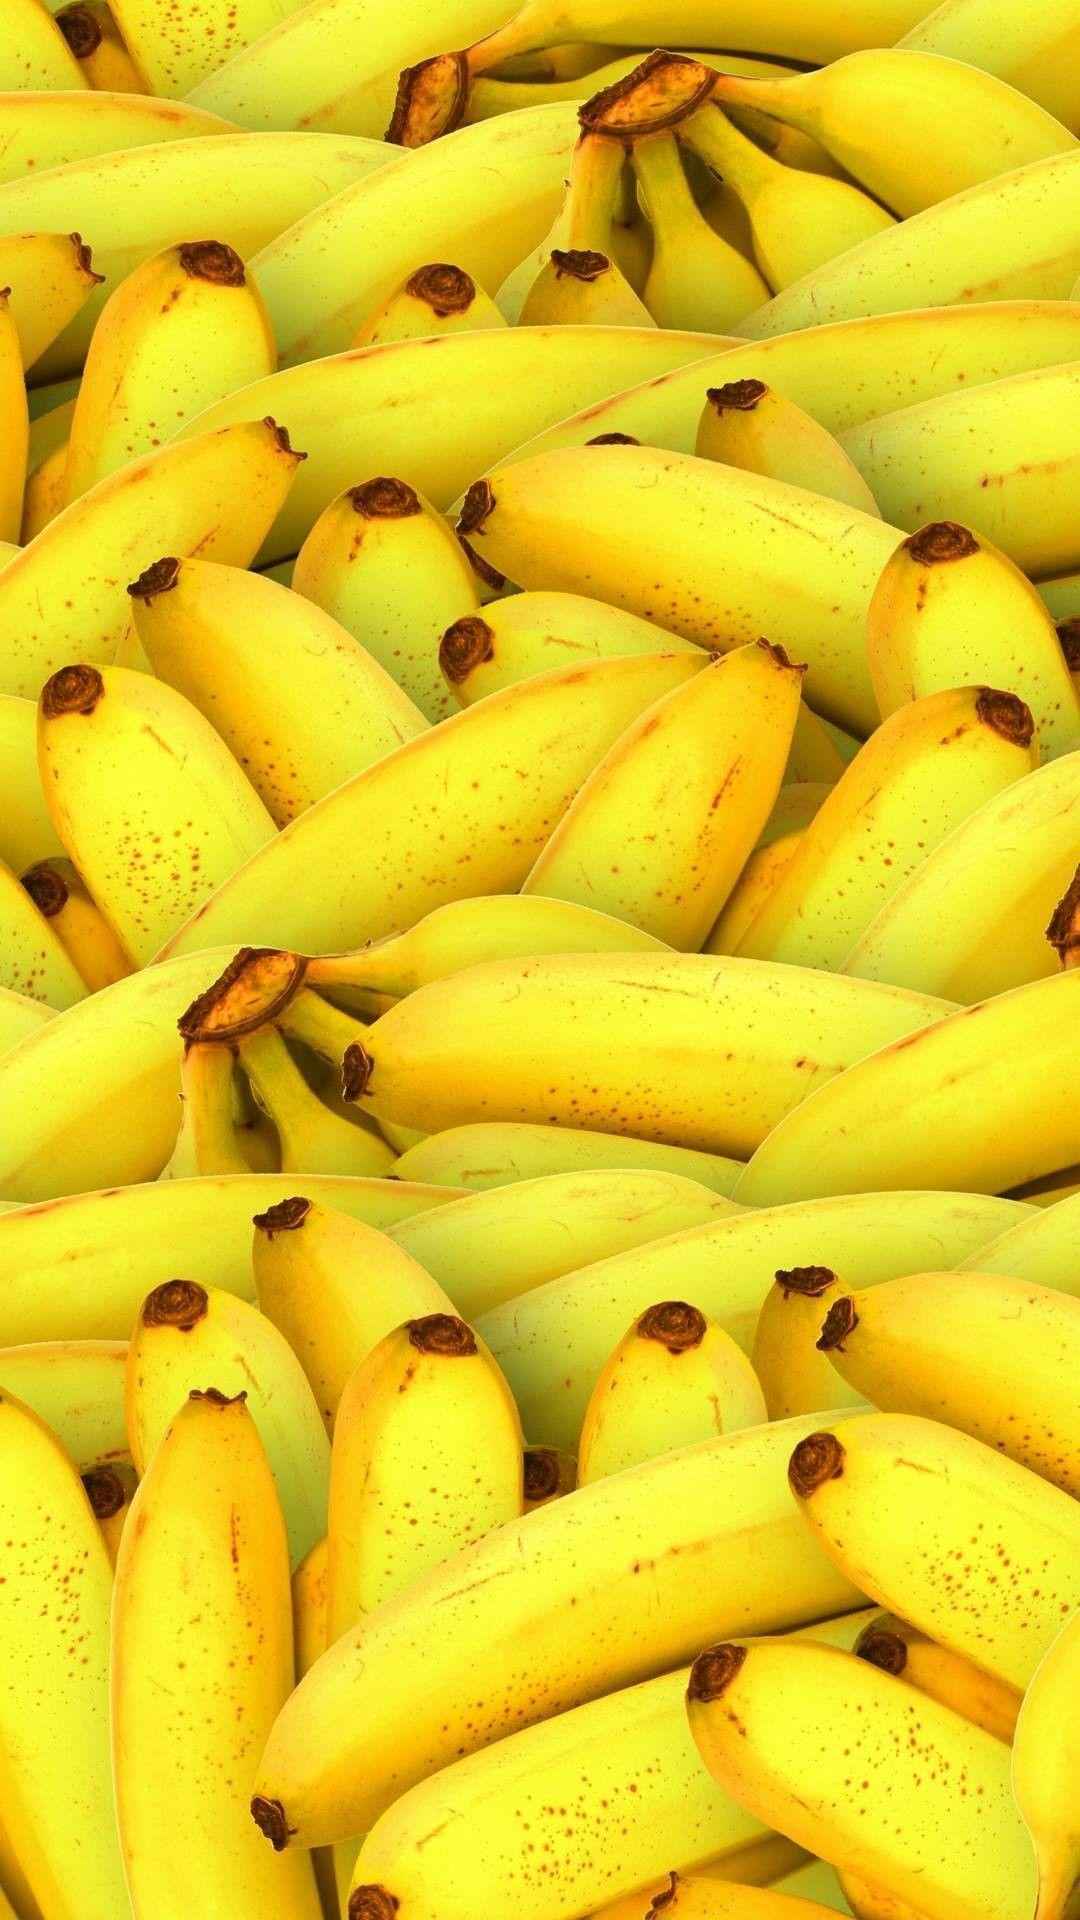 A whole bunch of bananas wallpaper fruit banana banana